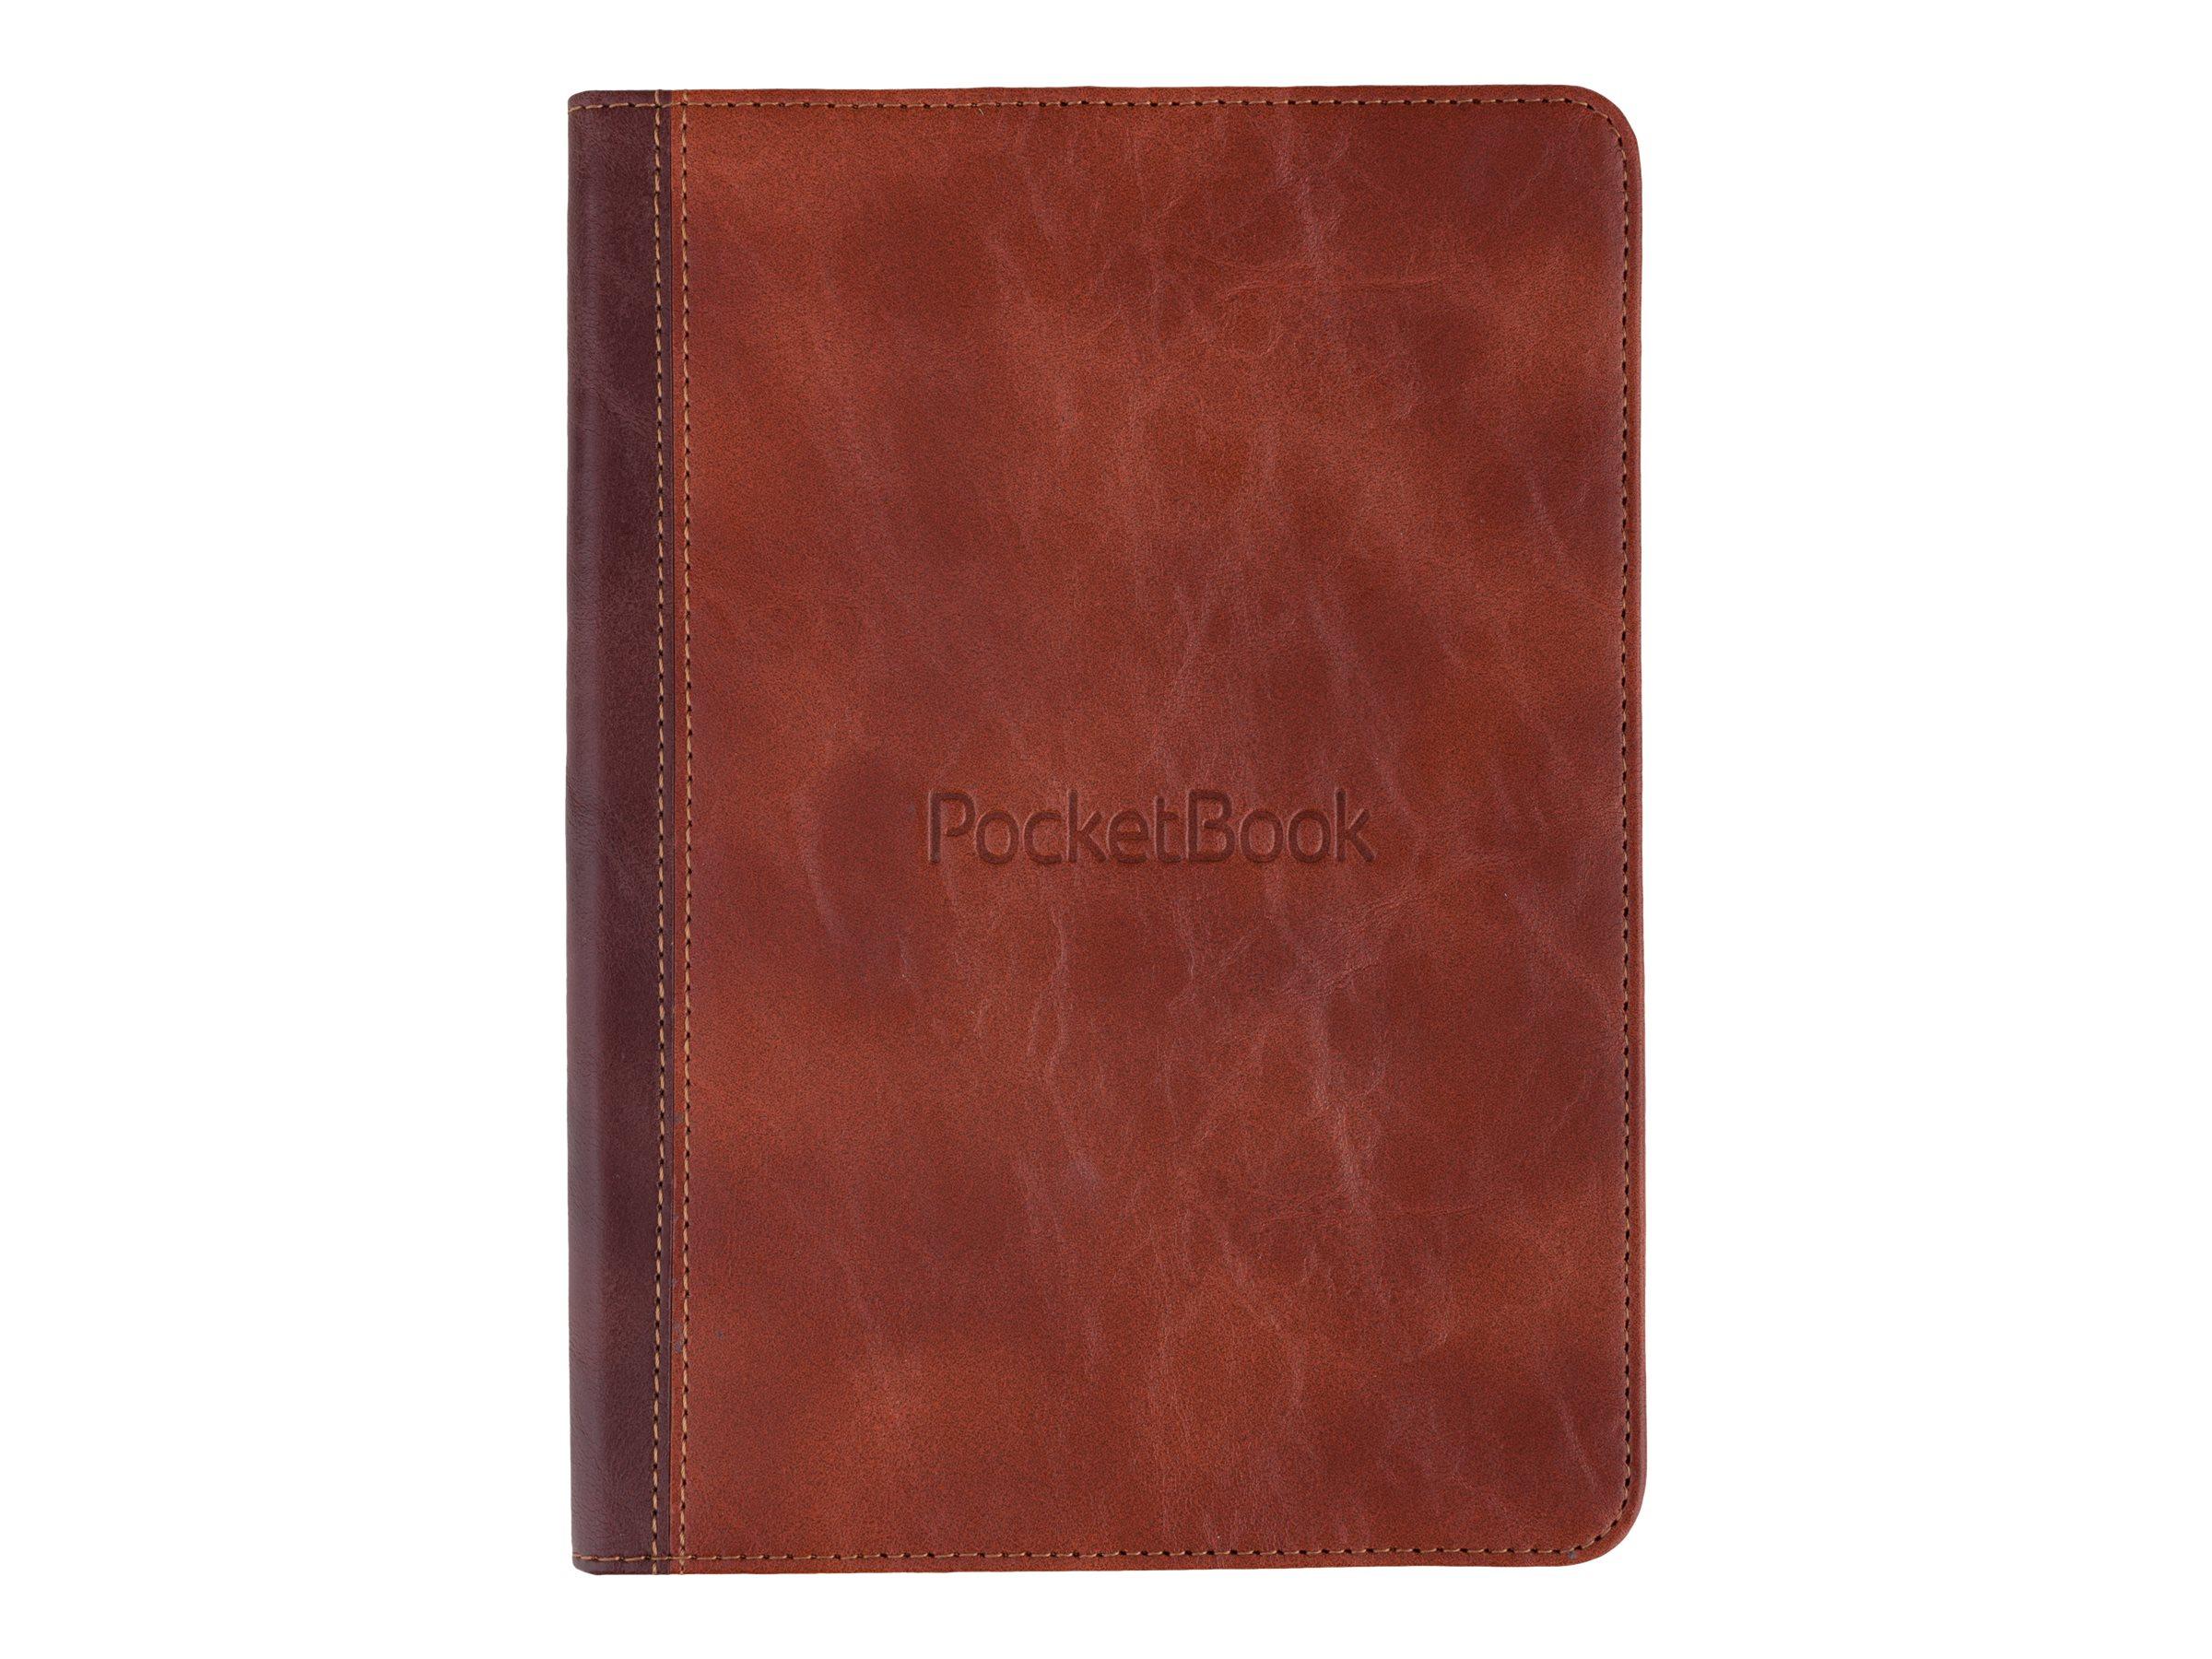 PocketBook - Flip-Hülle für eBook-Reader - Polyurethan-Kunstleder - braun - für PocketBook InkPad 3